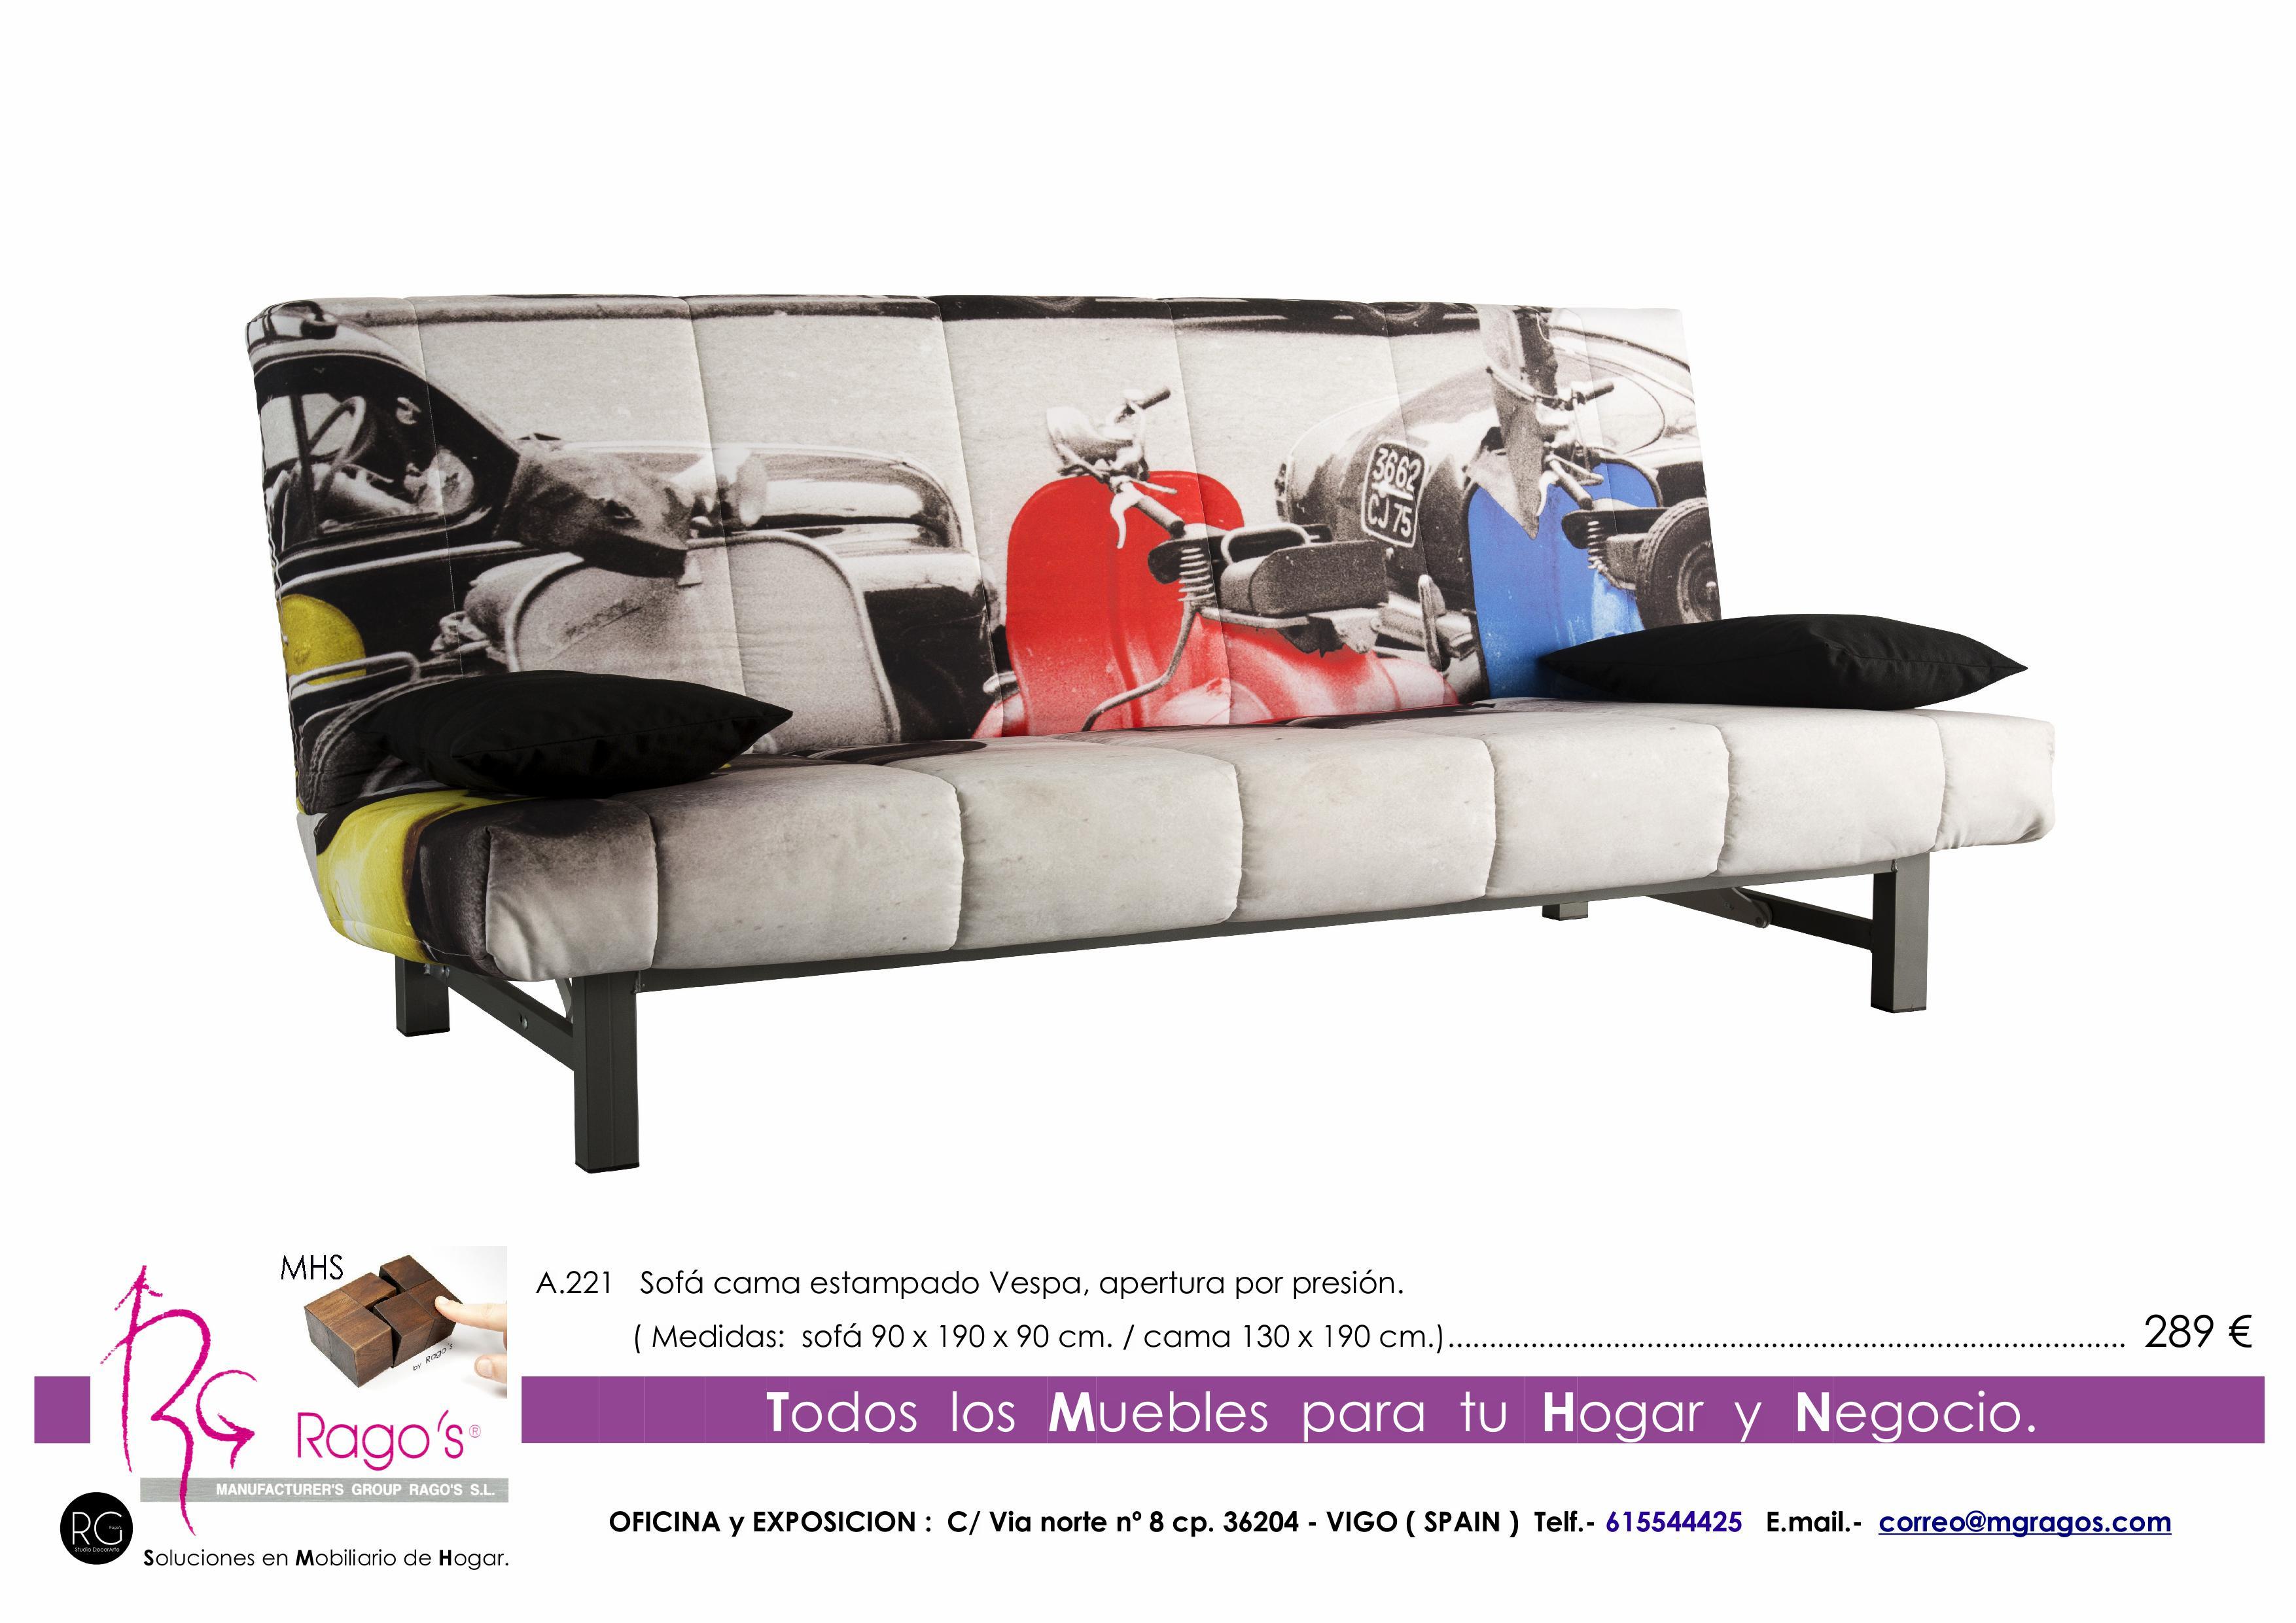 A.221 Sofa Cama Pag. nº 19